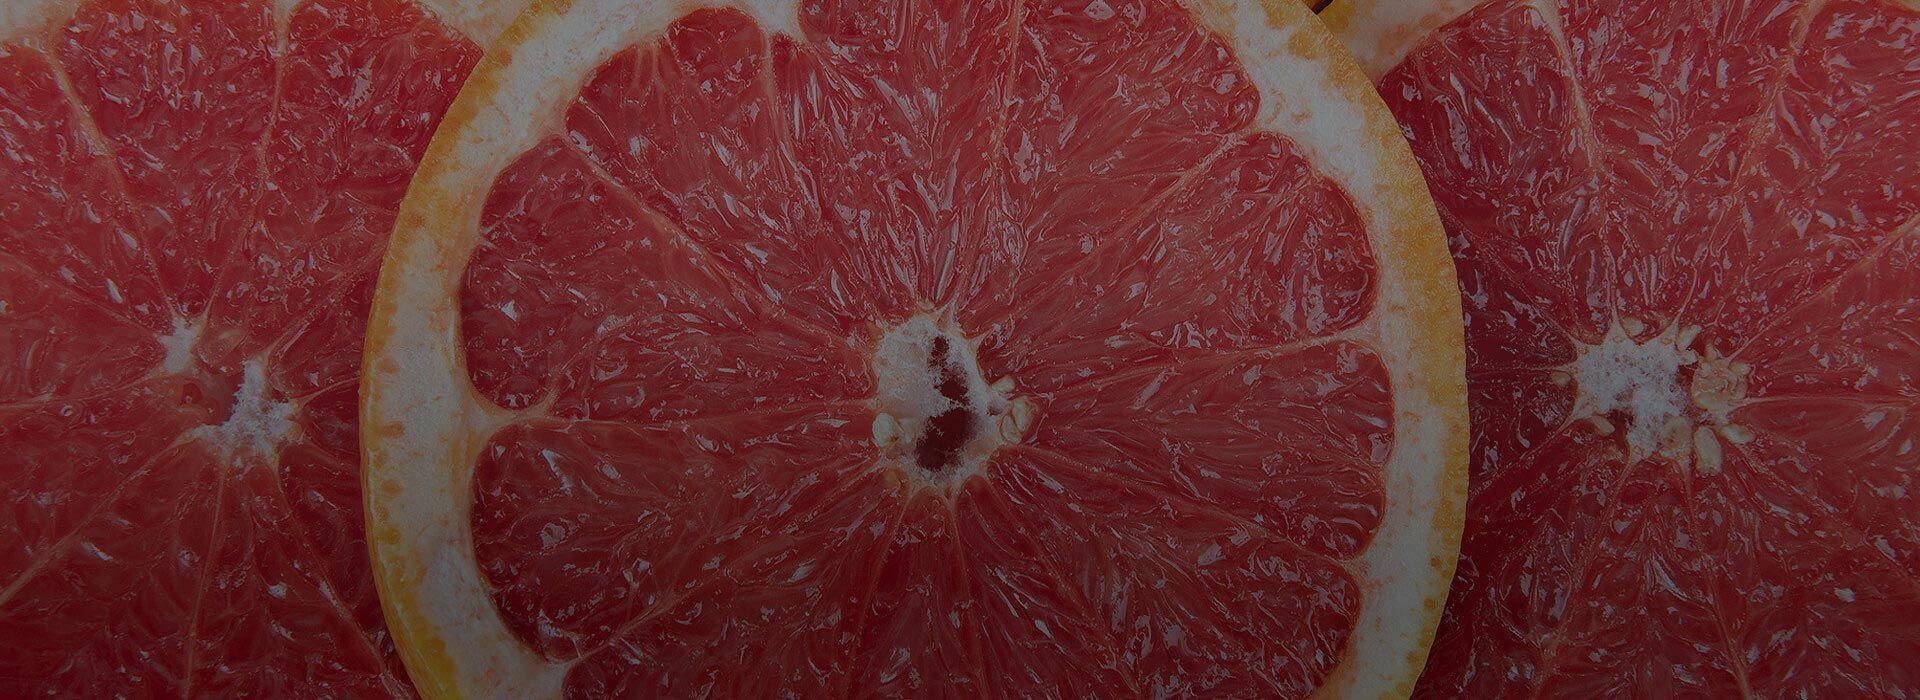 Venta de fruta a empresas en Sevilla